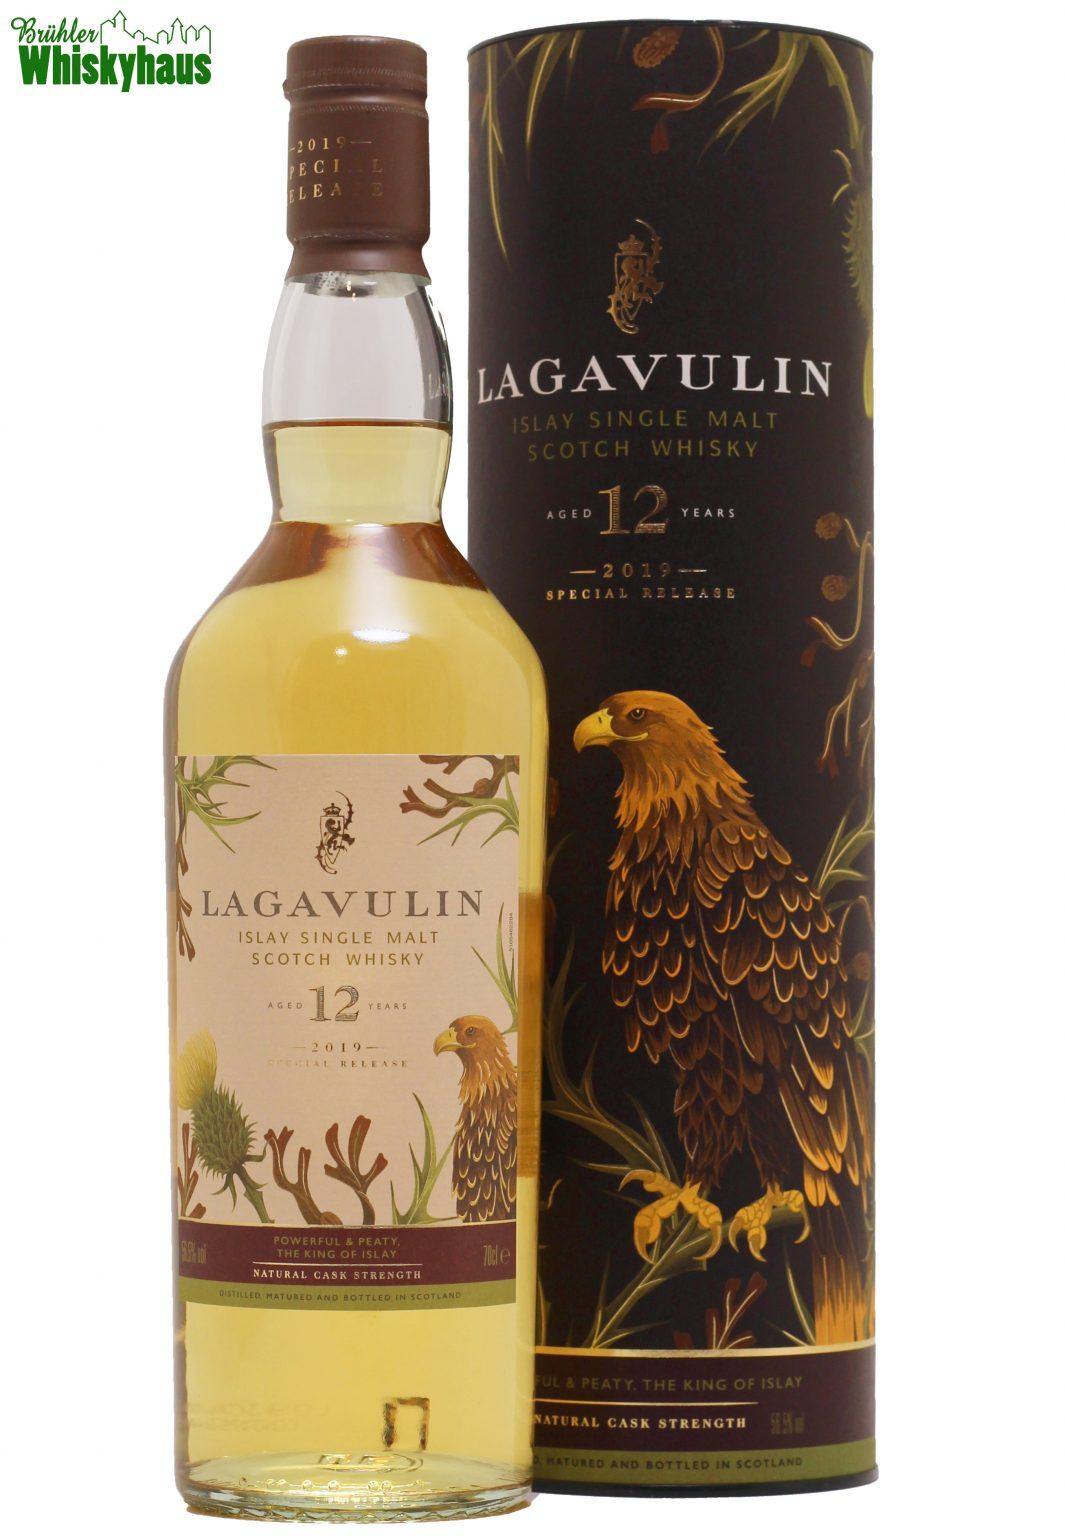 Lagavulin 12 Jahre - American Hogshead - Distillery Bottling Diageo Special Releases 2019 - Single Malt scotch Whisky